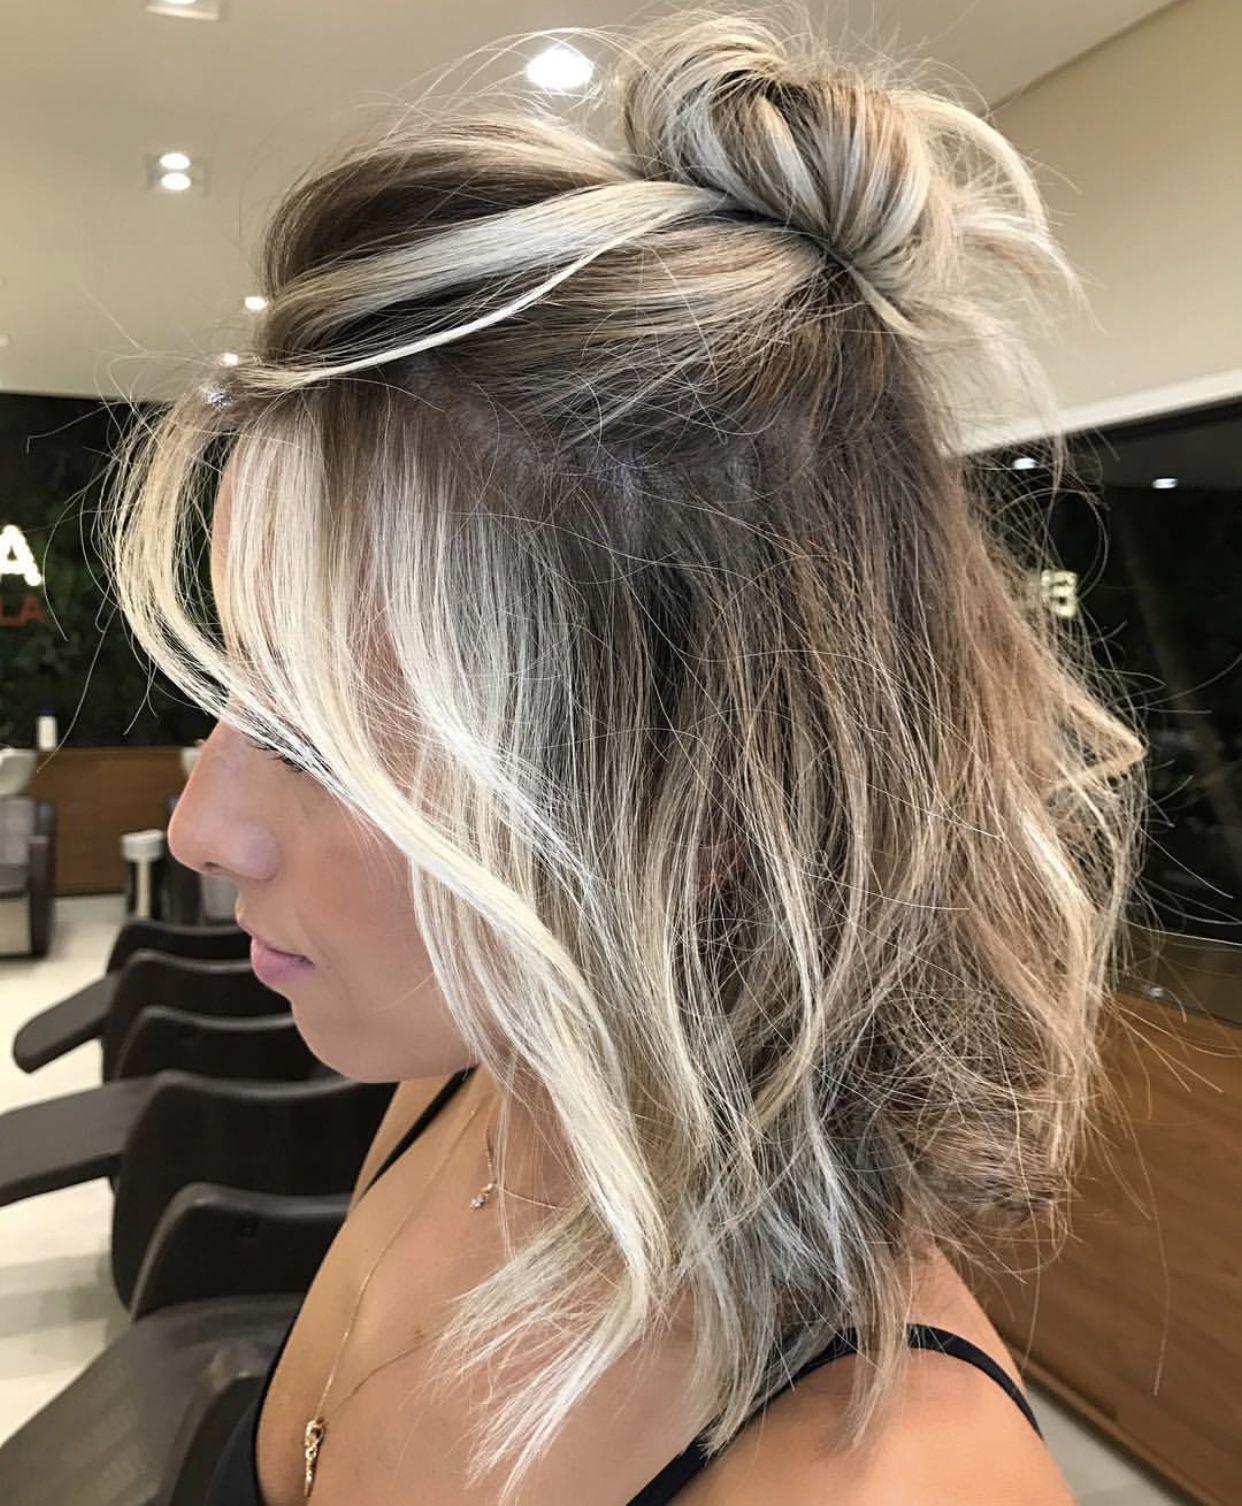 Perfect Half Up Half Down Hairstyle Halfuphalfdown Hairstyleideas Short Hair Styles Easy Medium Length Hair Styles Medium Hair Styles